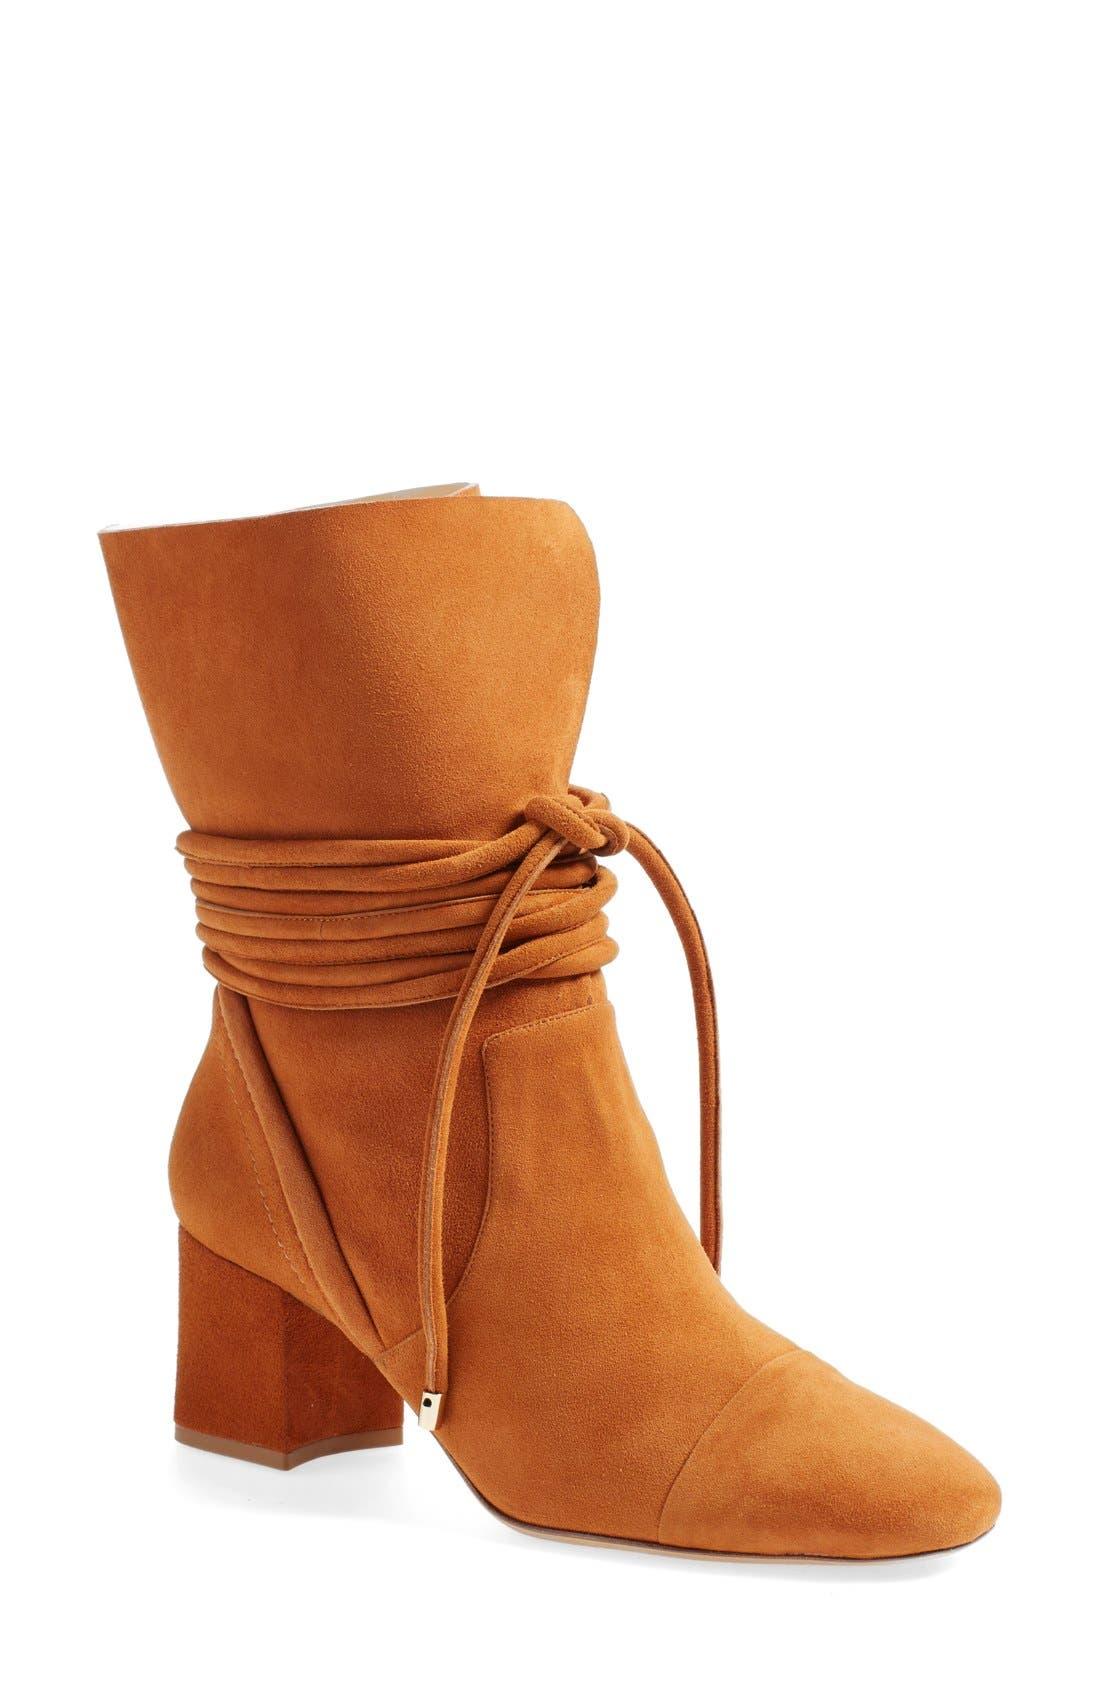 Main Image - Alexandre Birman 'Betsy' Wraparound Tie Boot (Women)